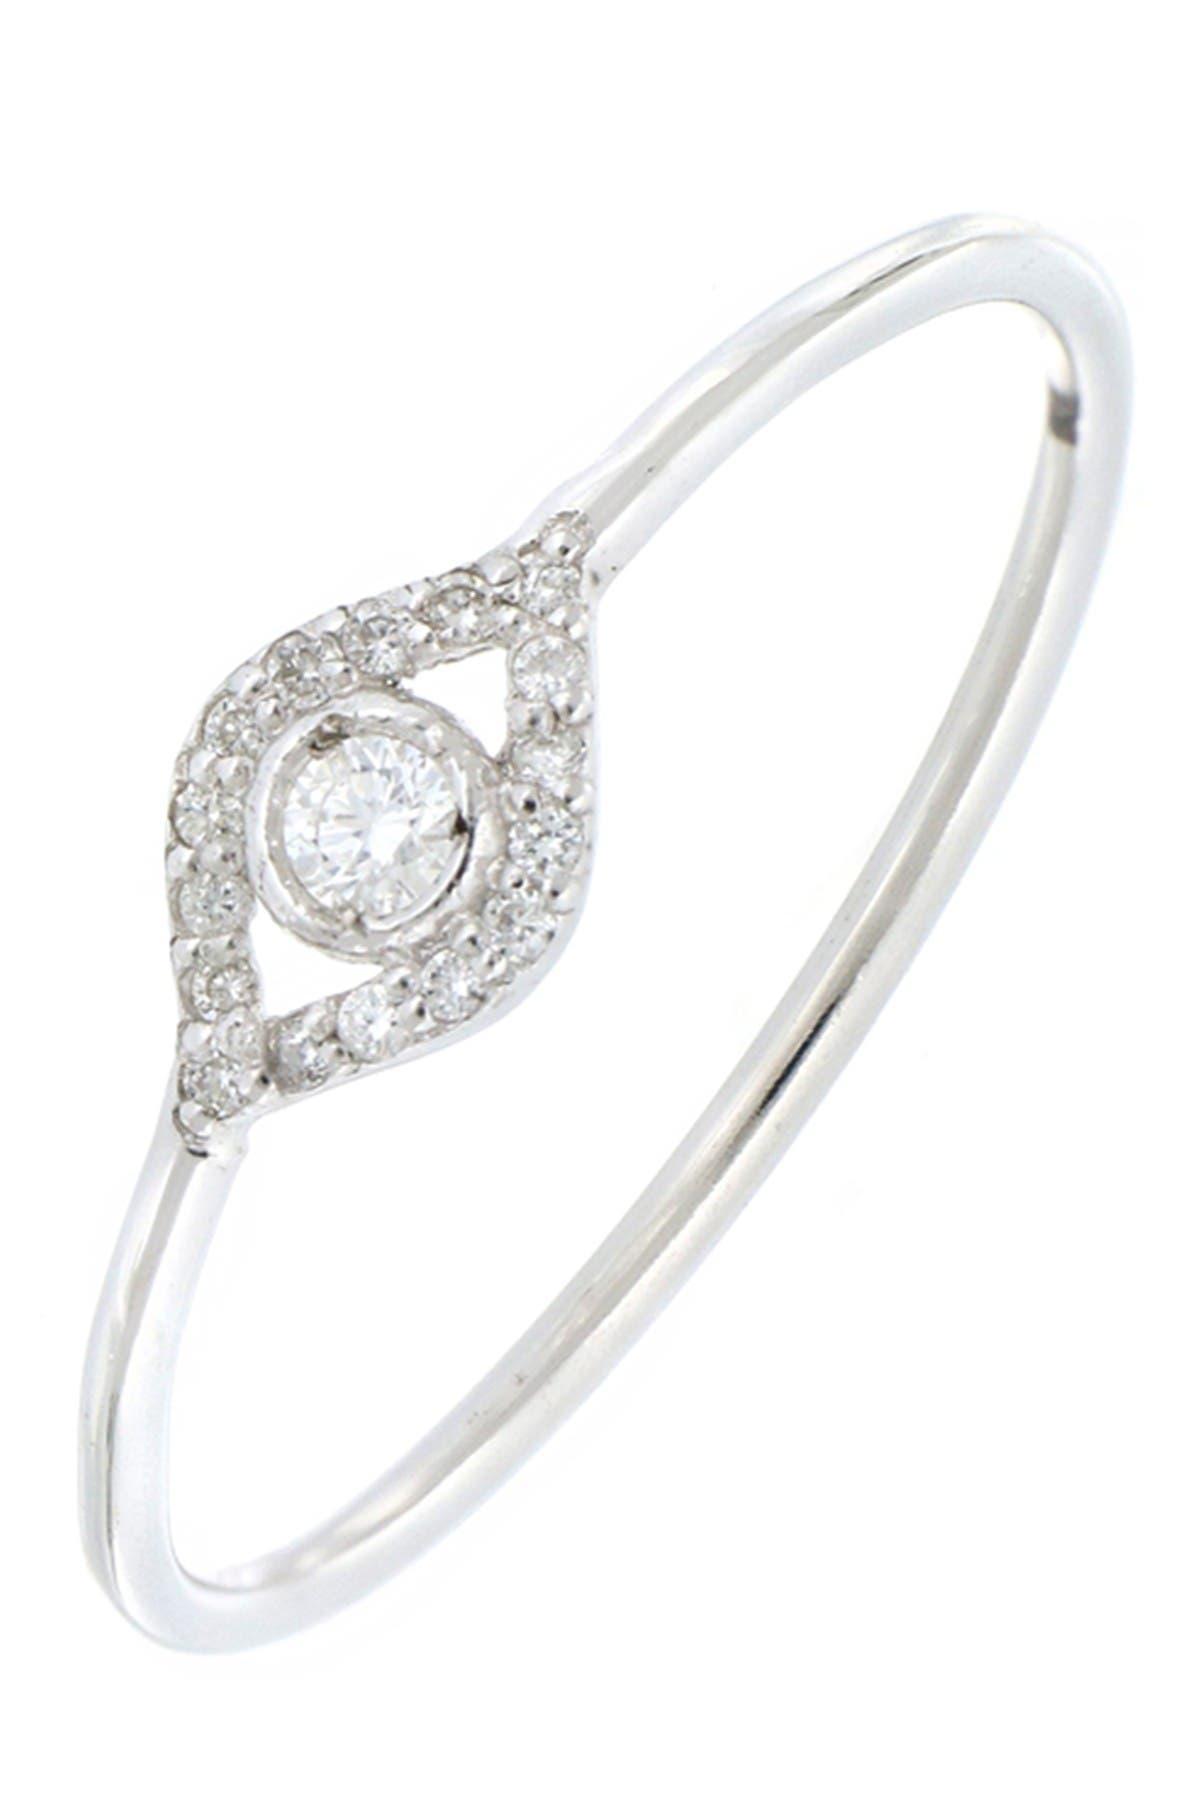 Image of Bony Levy BL Icons 18K White Gold Pave Diamond Petite Evil Eye Ring - 0.08 ctw